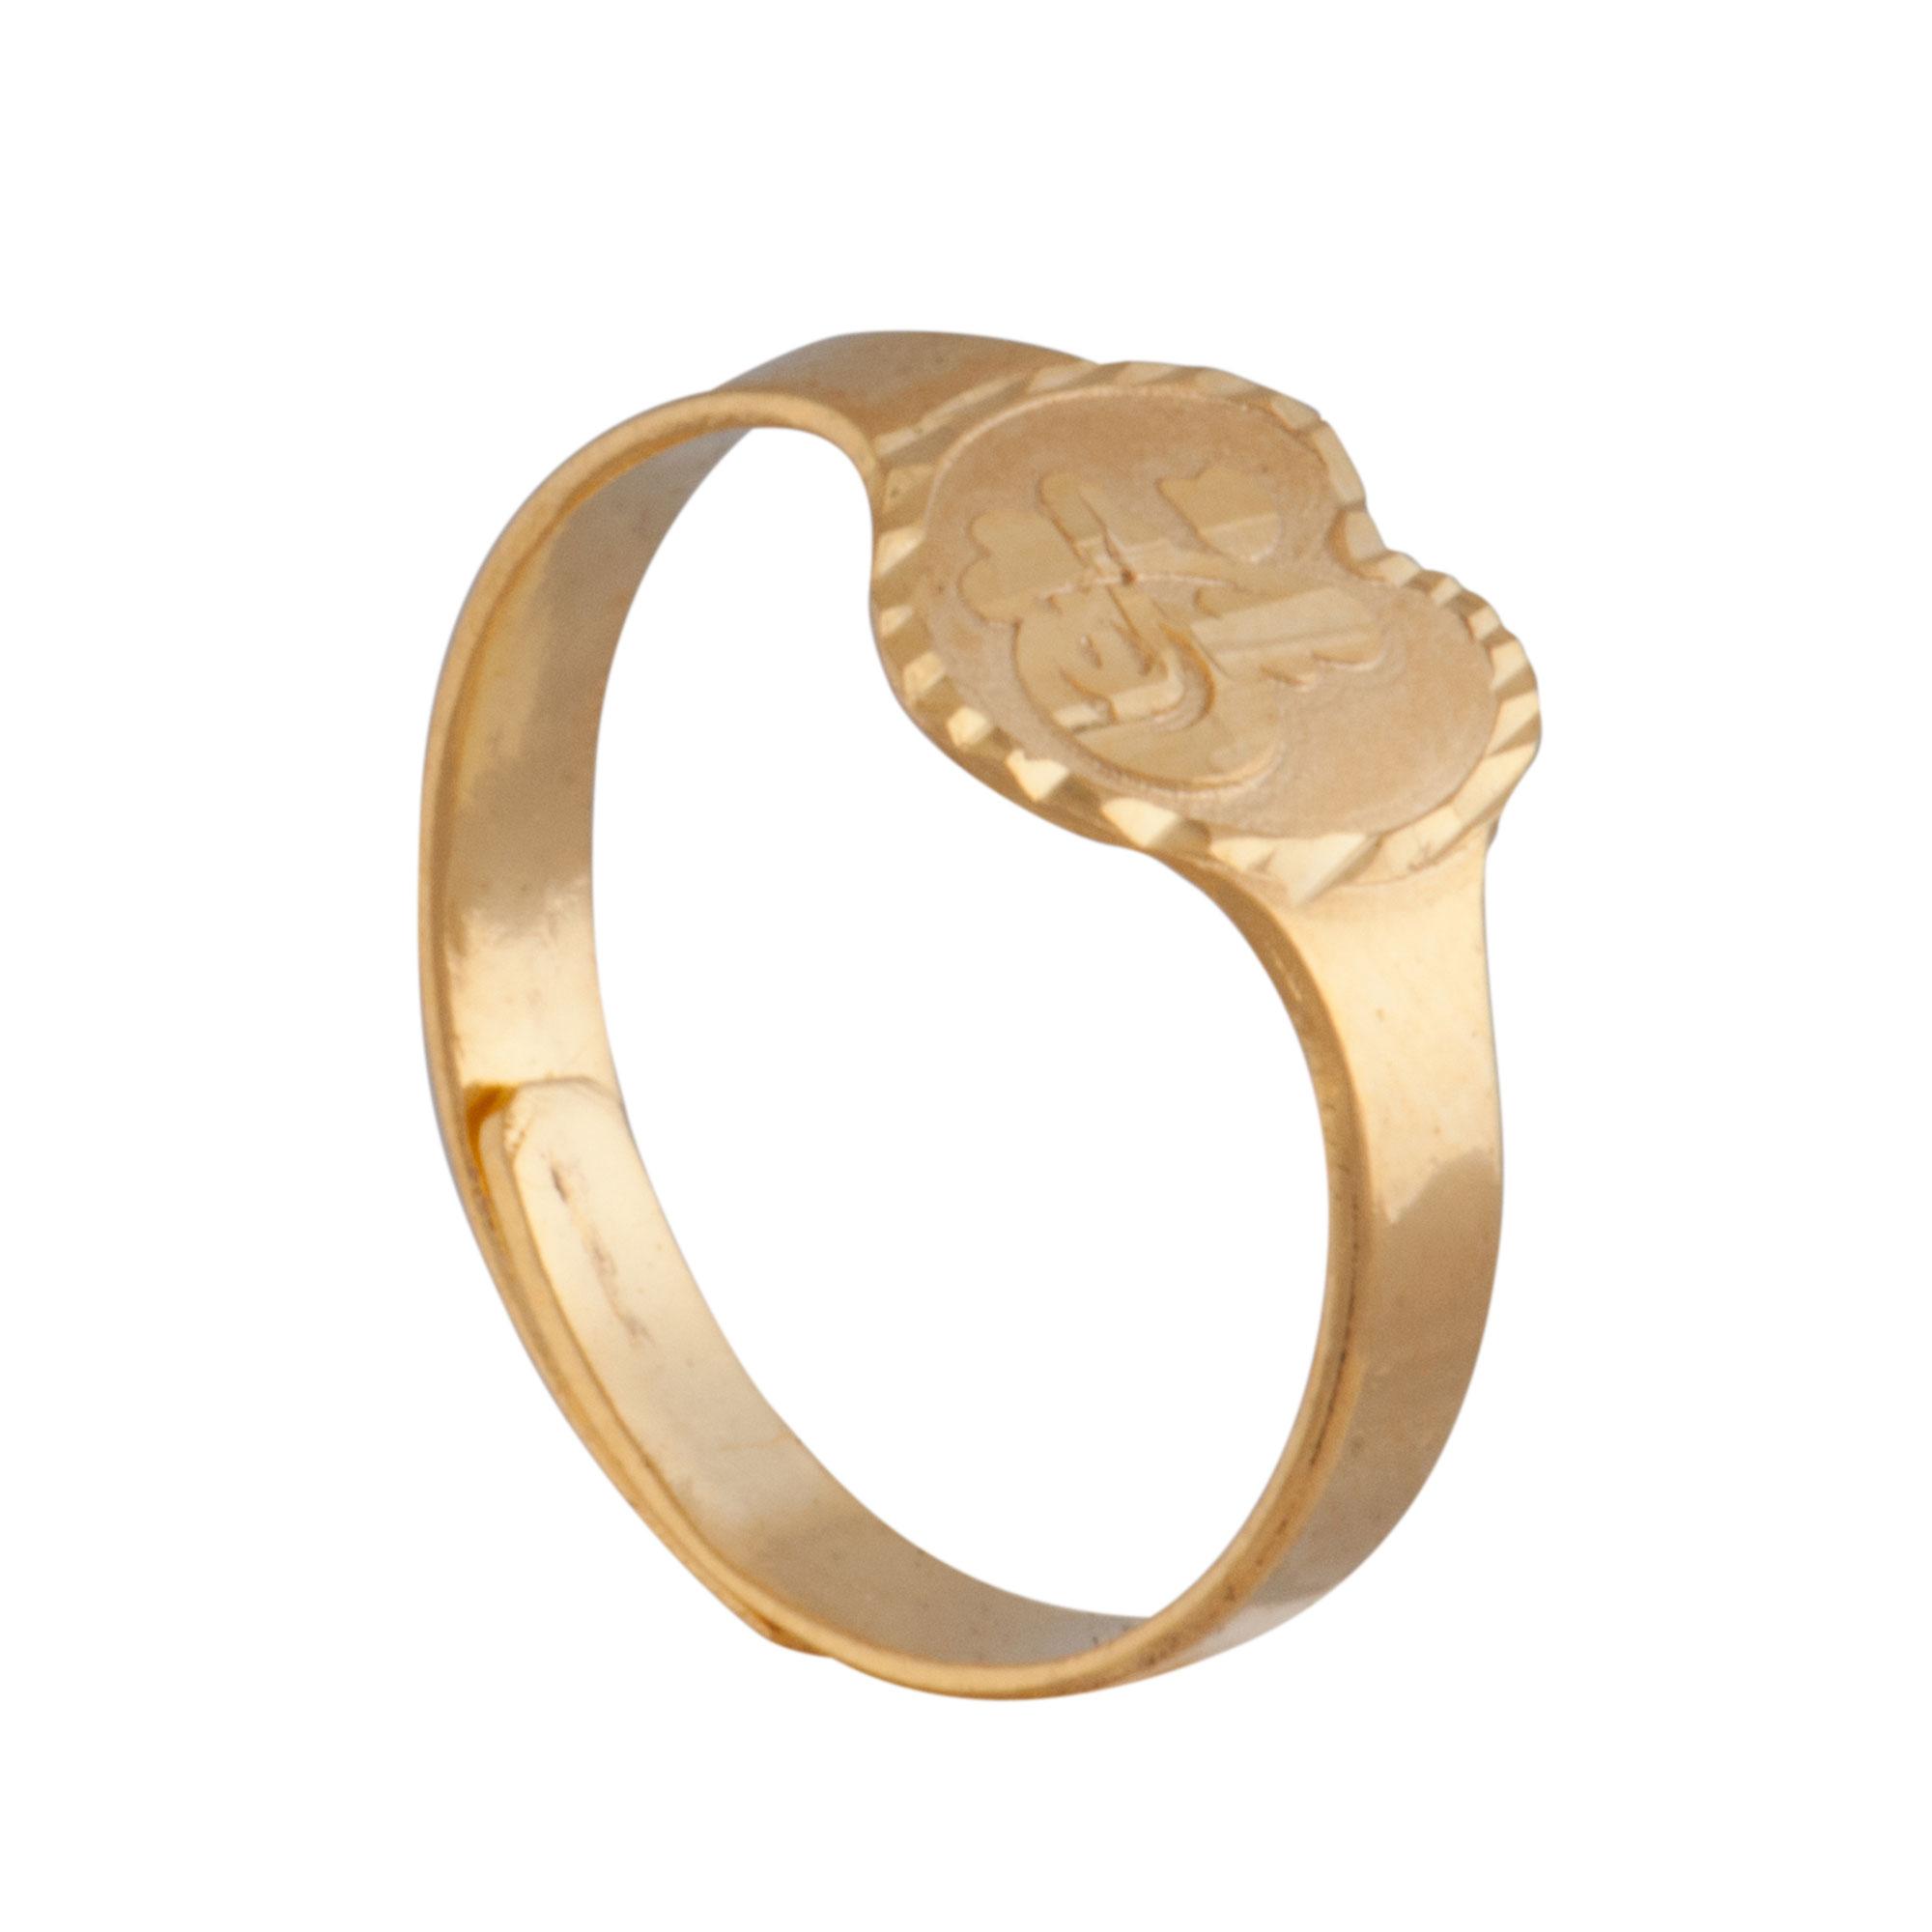 Memilih Cincin Emas untuk Anak yang Aman, Ini Tipsnya